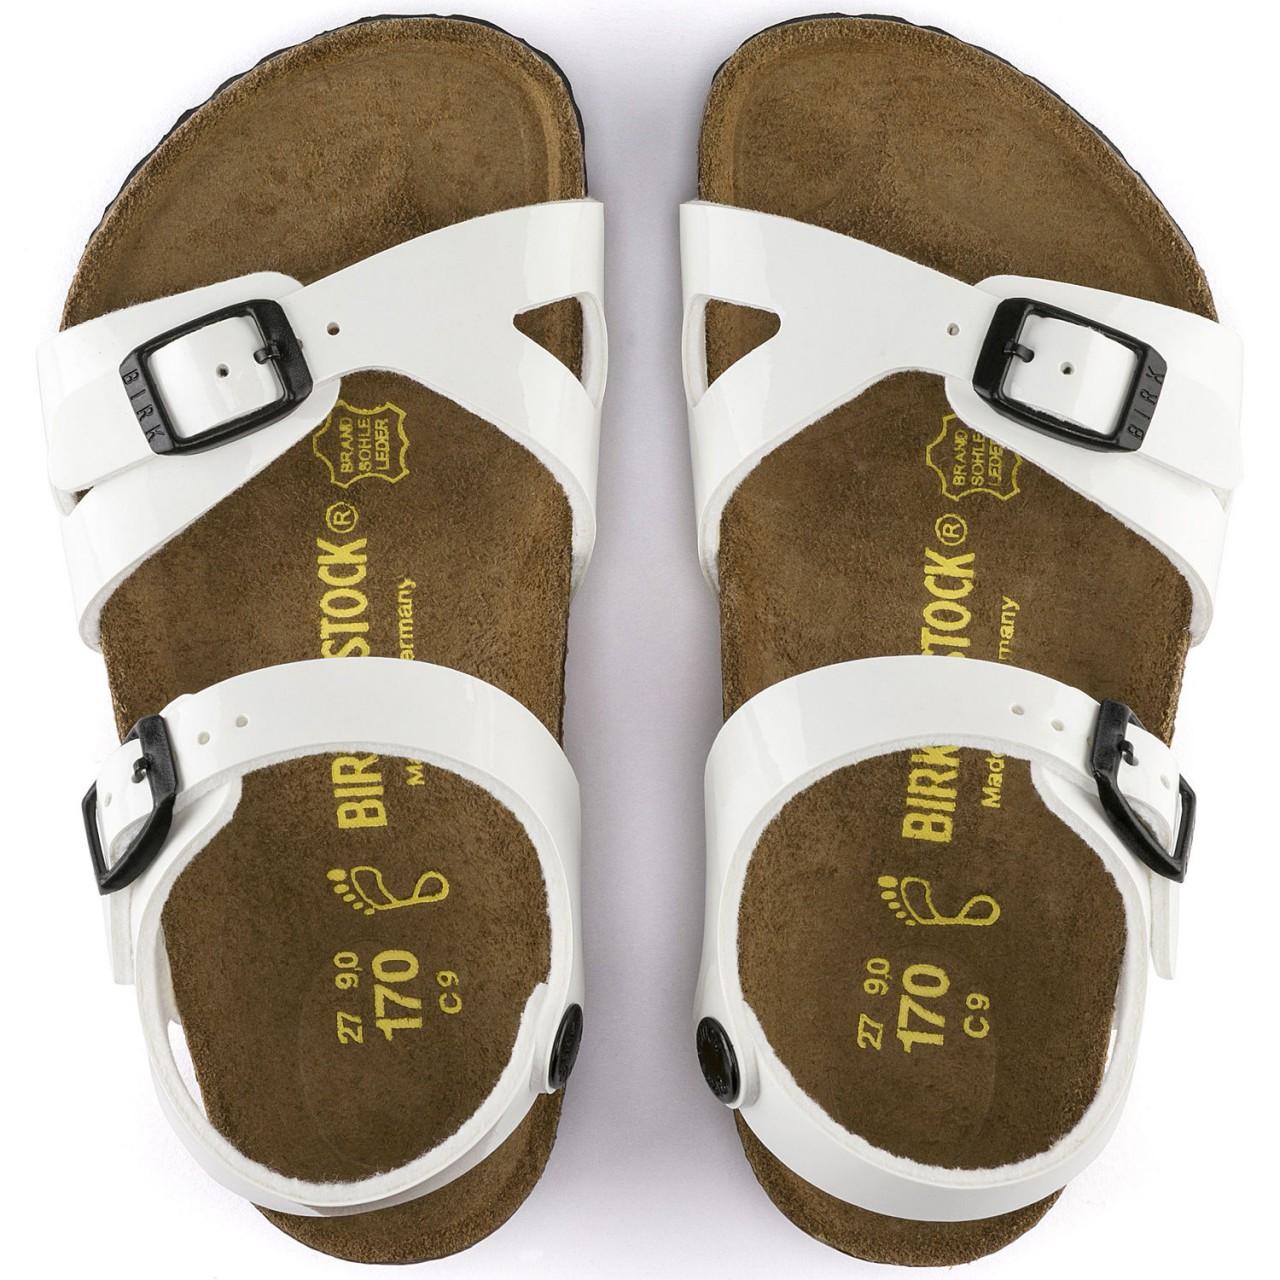 birkenstock-rio-white-birkenstock-1014442-2020-bianco-sandalo-bimba-amazon-nencini-sport-pavia-padova-parma